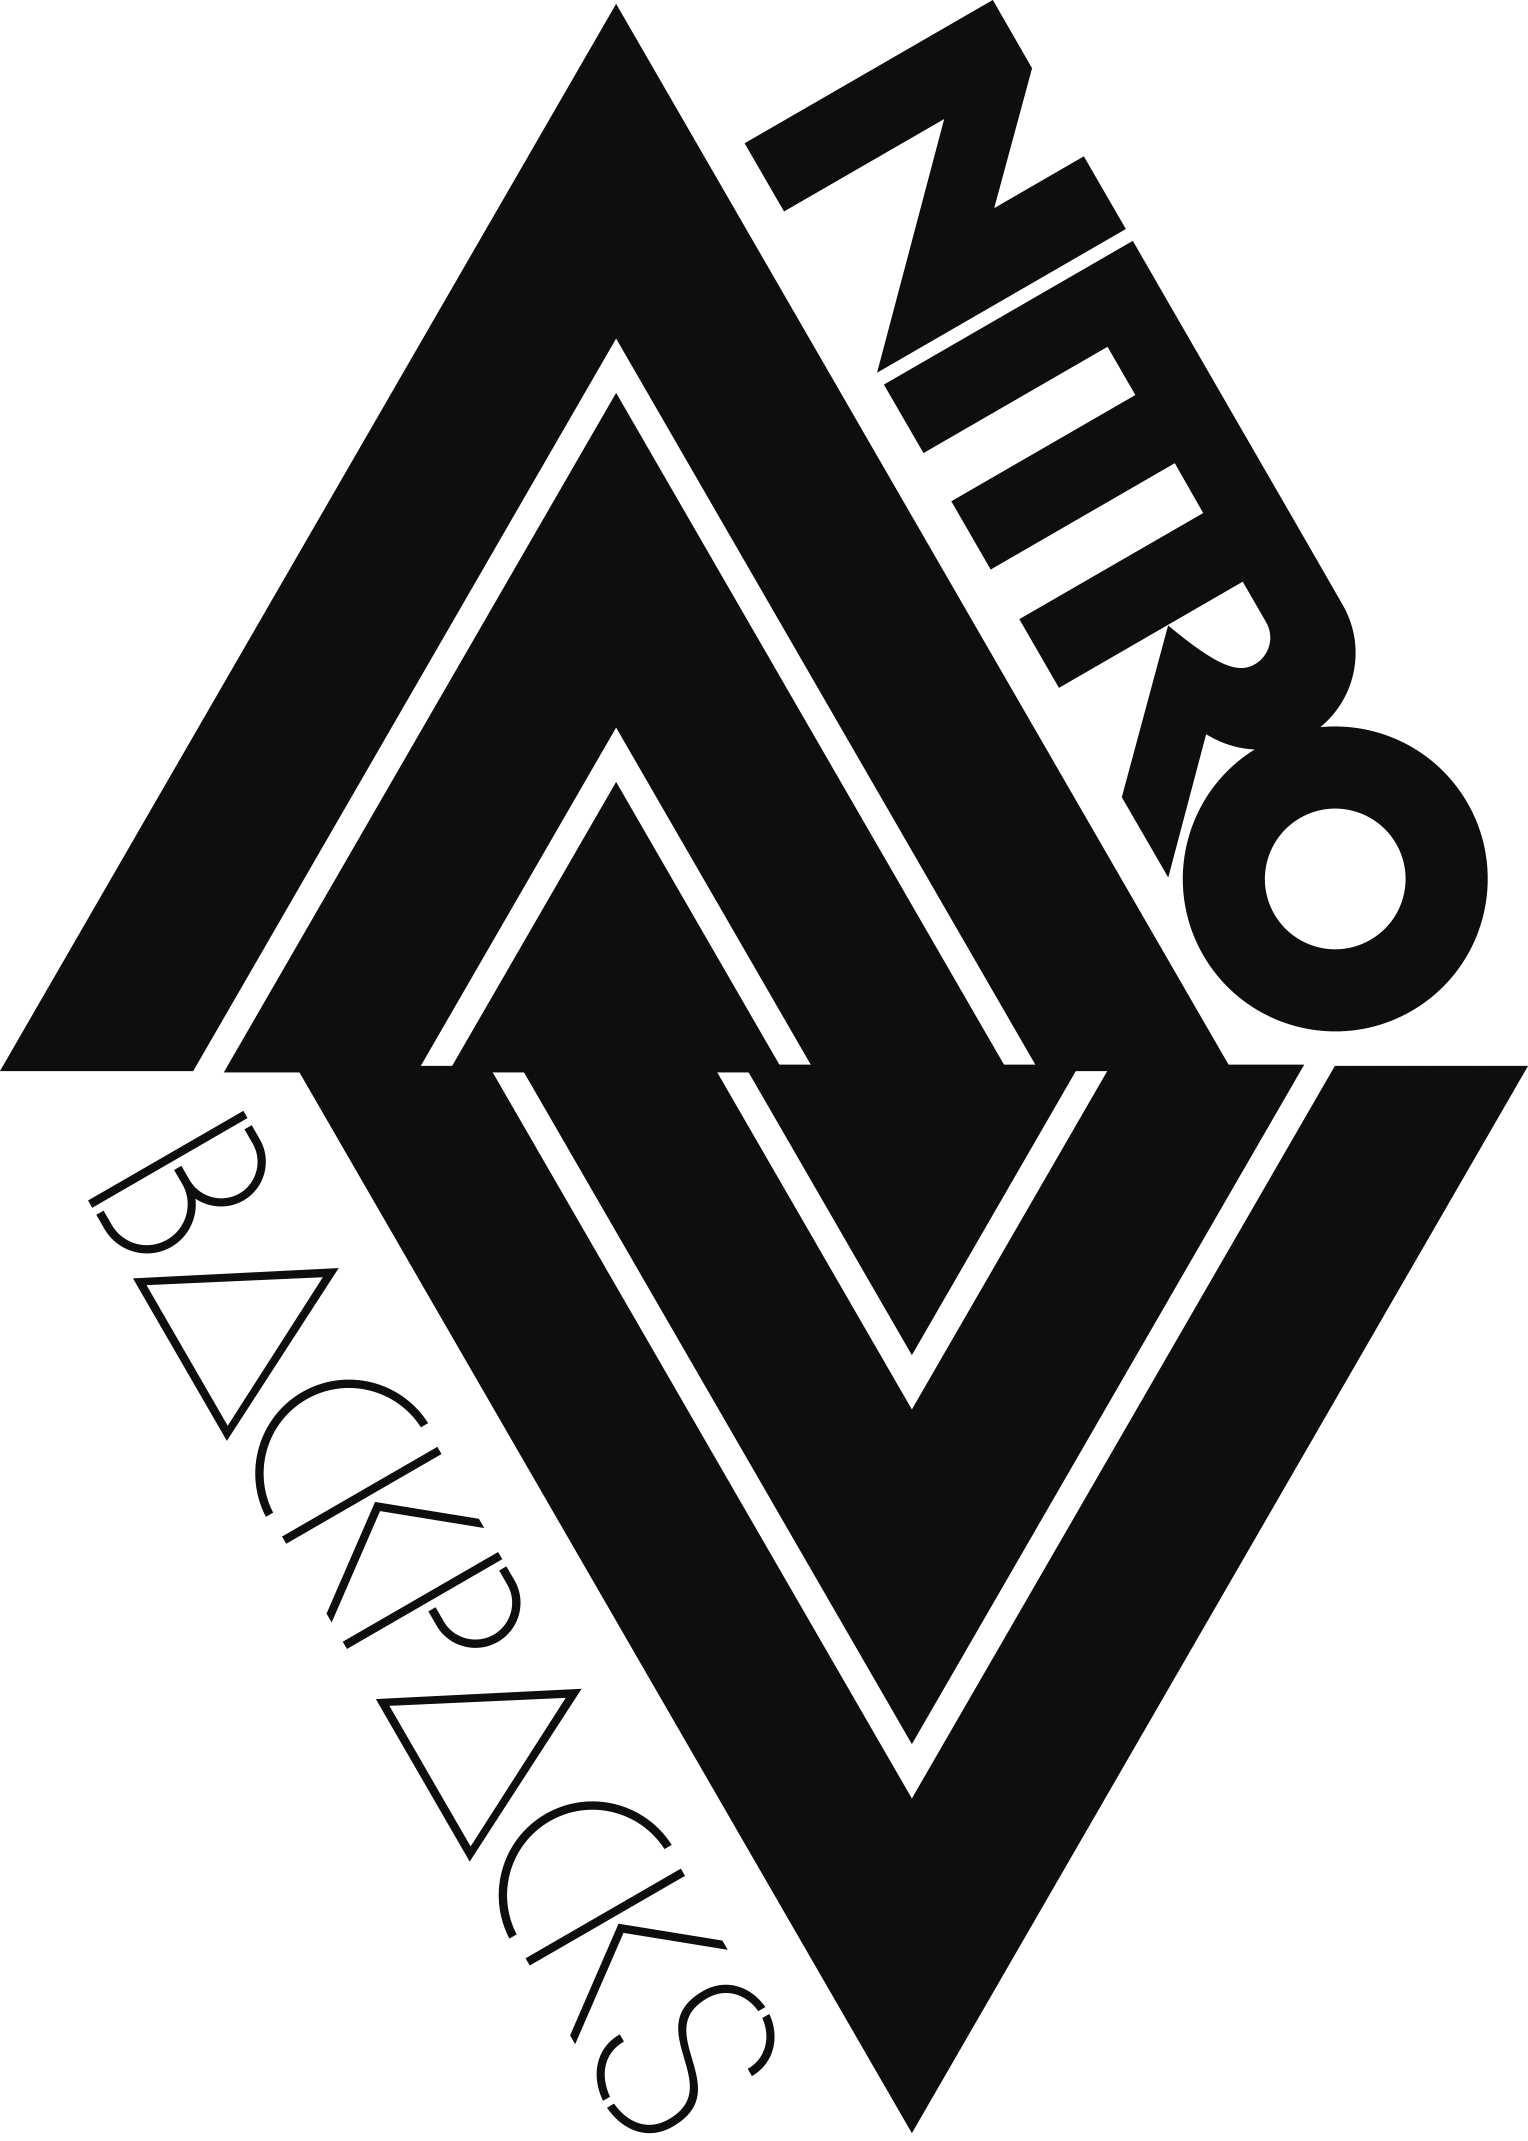 nitro-bags-logo.jpg